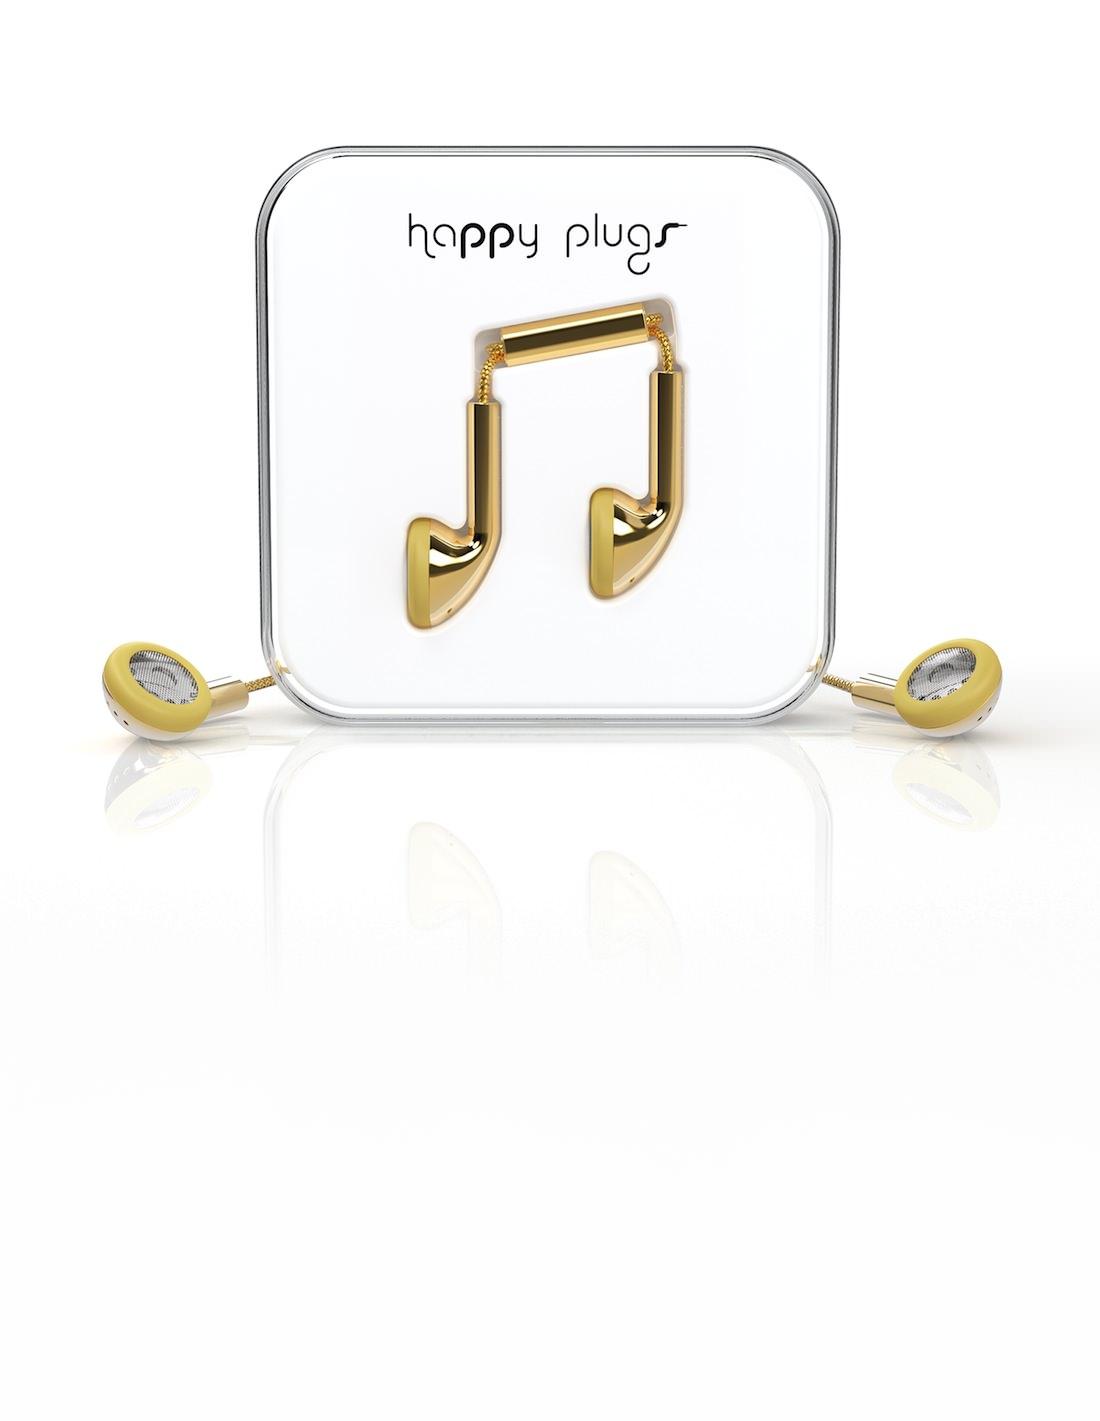 happy plugs gold